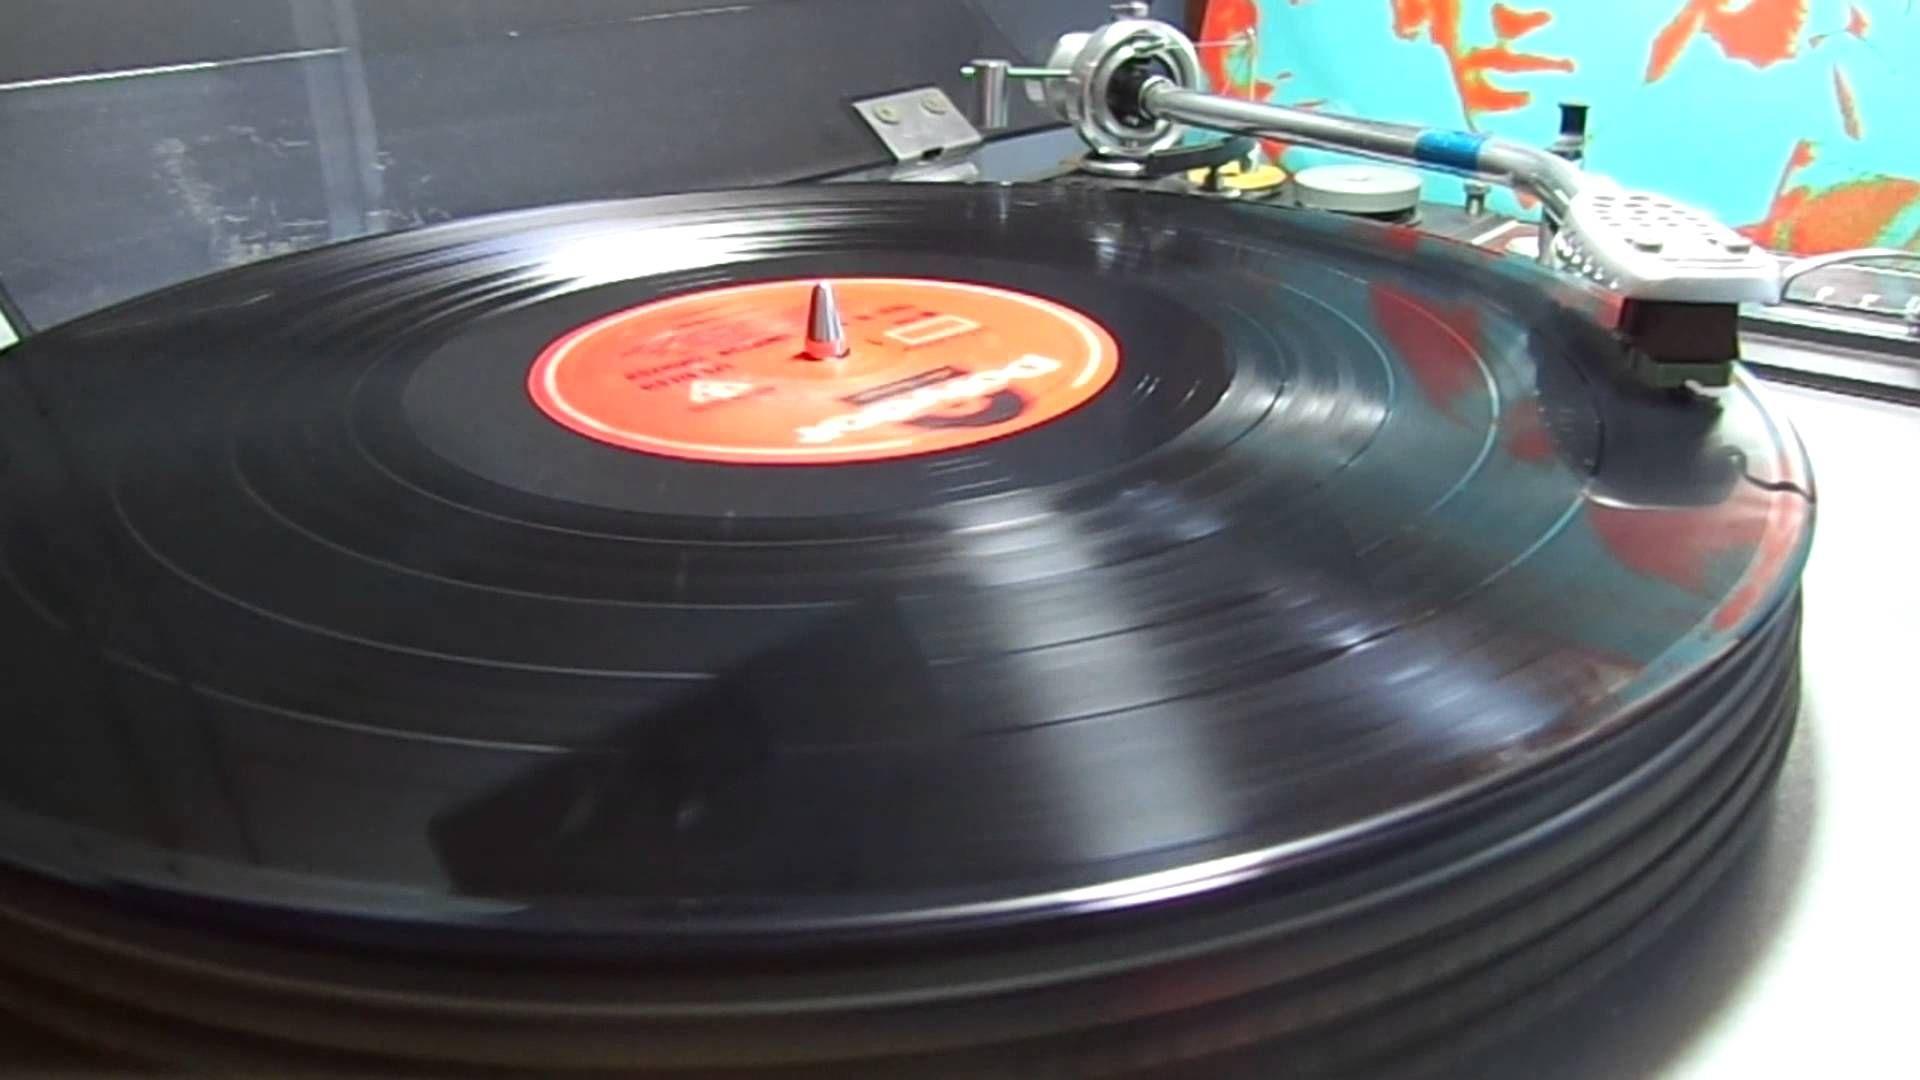 Lamplight - Bee Gees (Lp Mono 1969) First of May/Tomorrow Tomorrow (Braz...